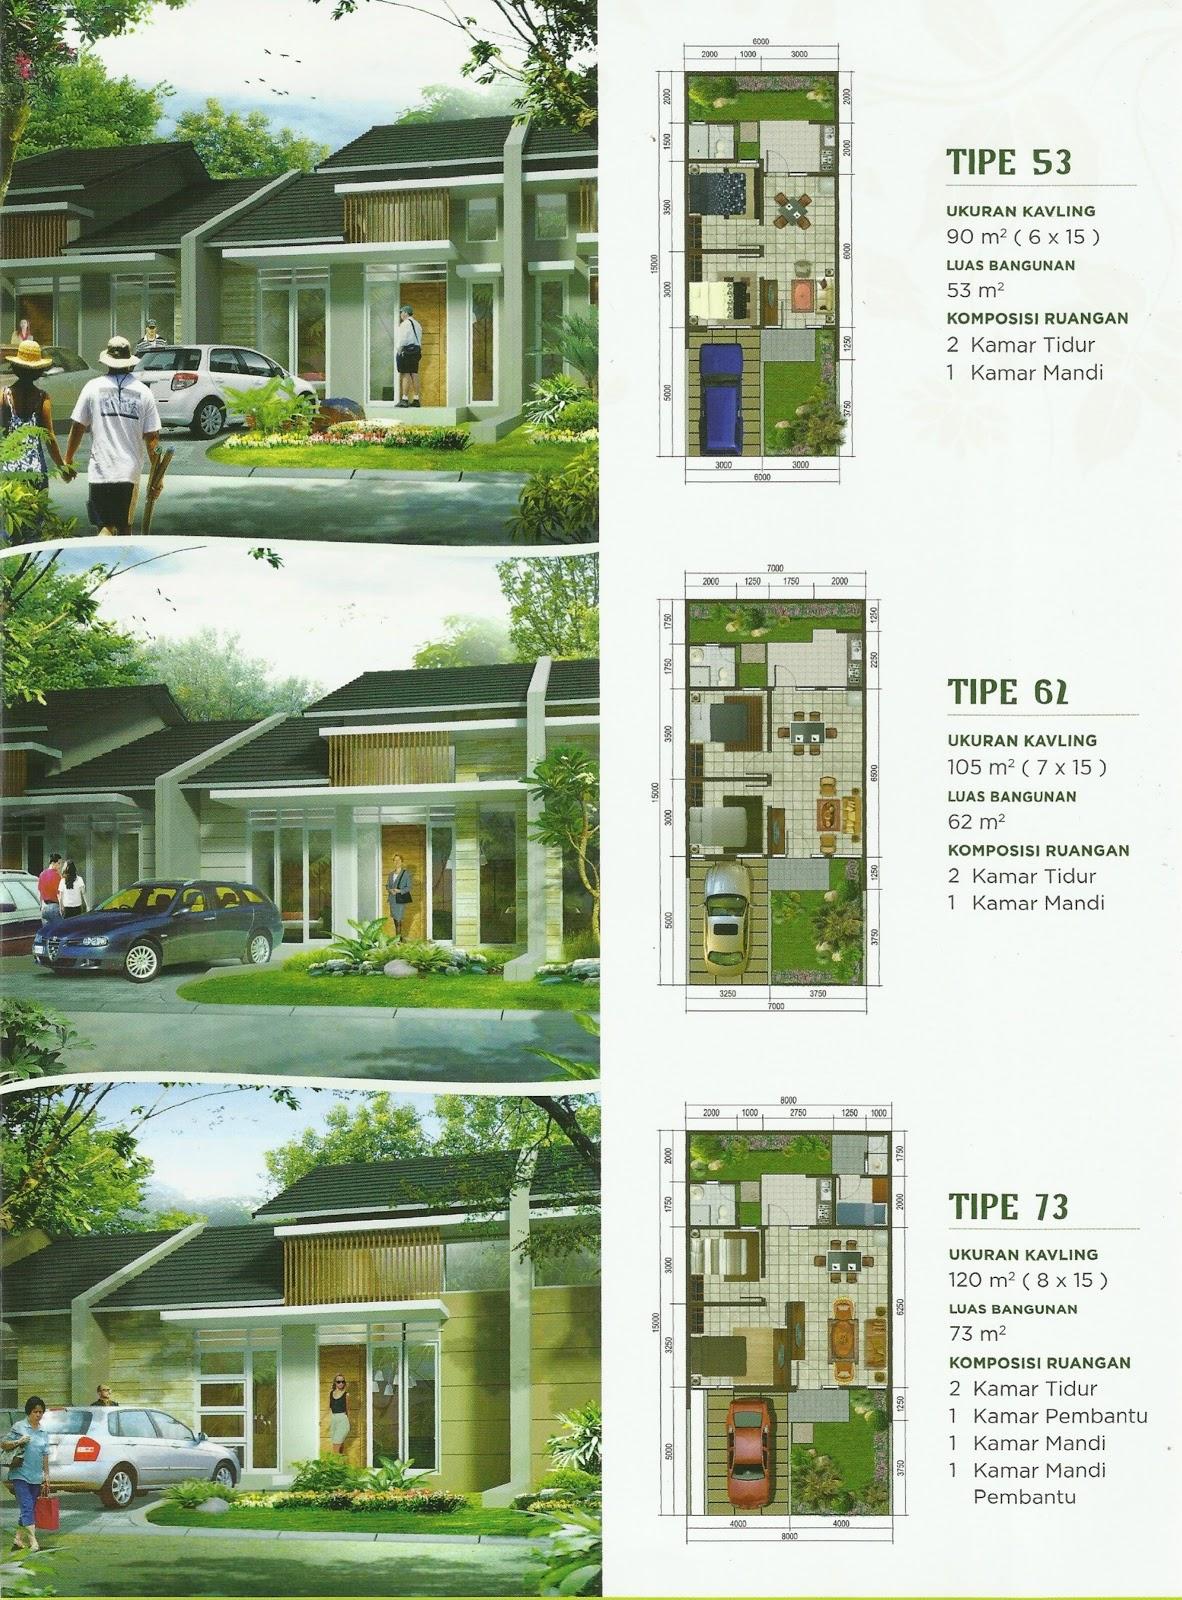 Sentul Alaya Cari Rumah Indonesia